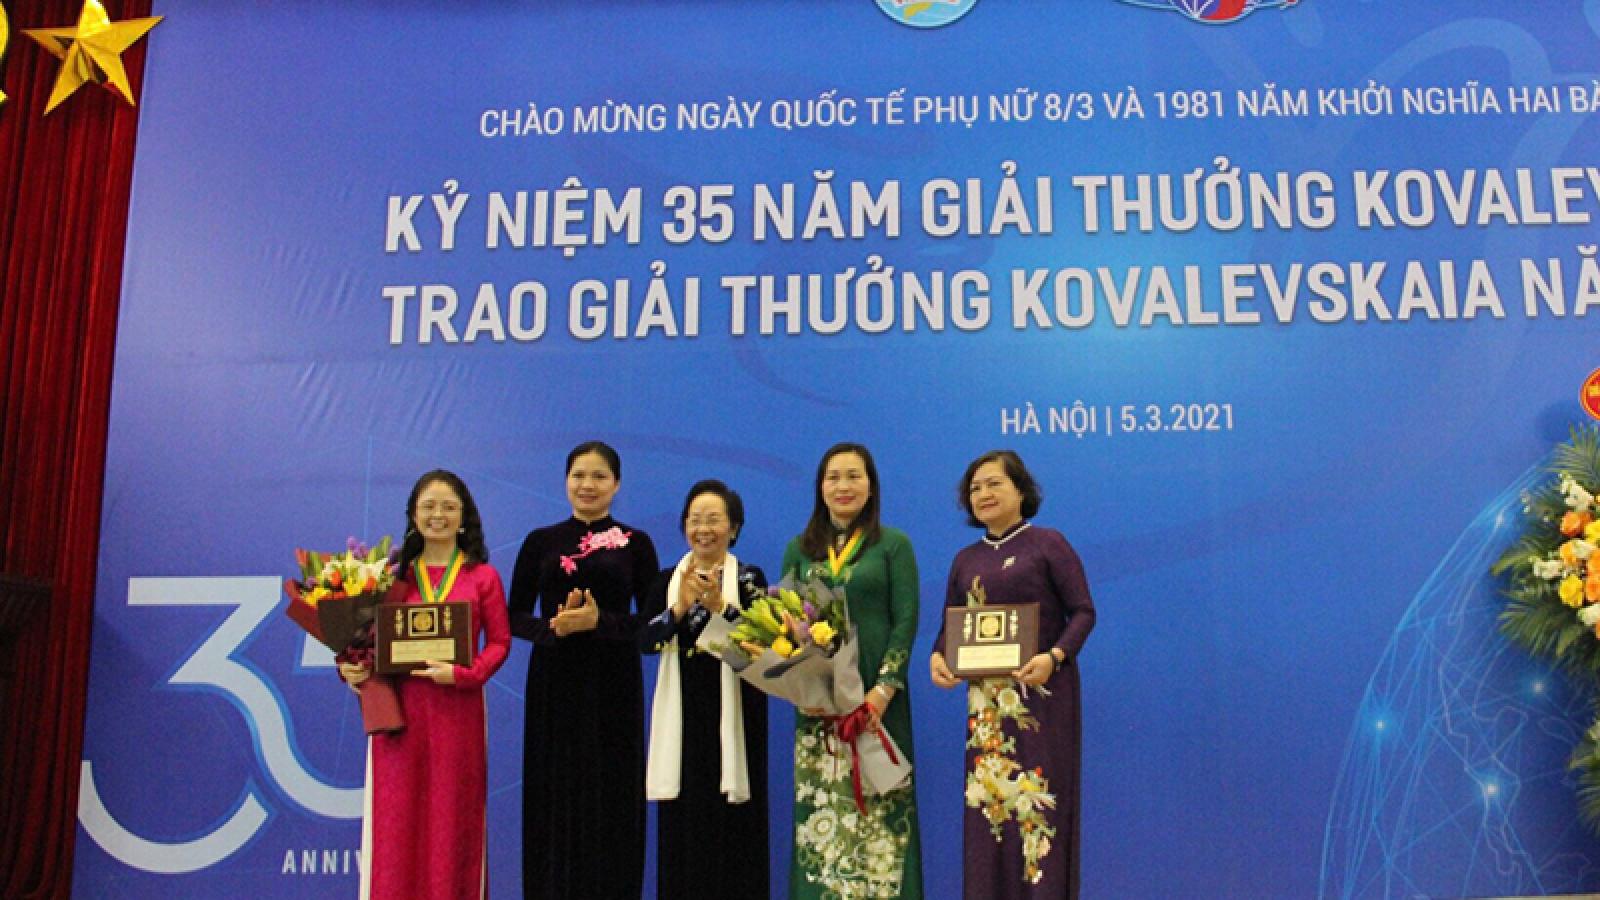 Female scientists receive Kovalevskaia Prize Award 2020